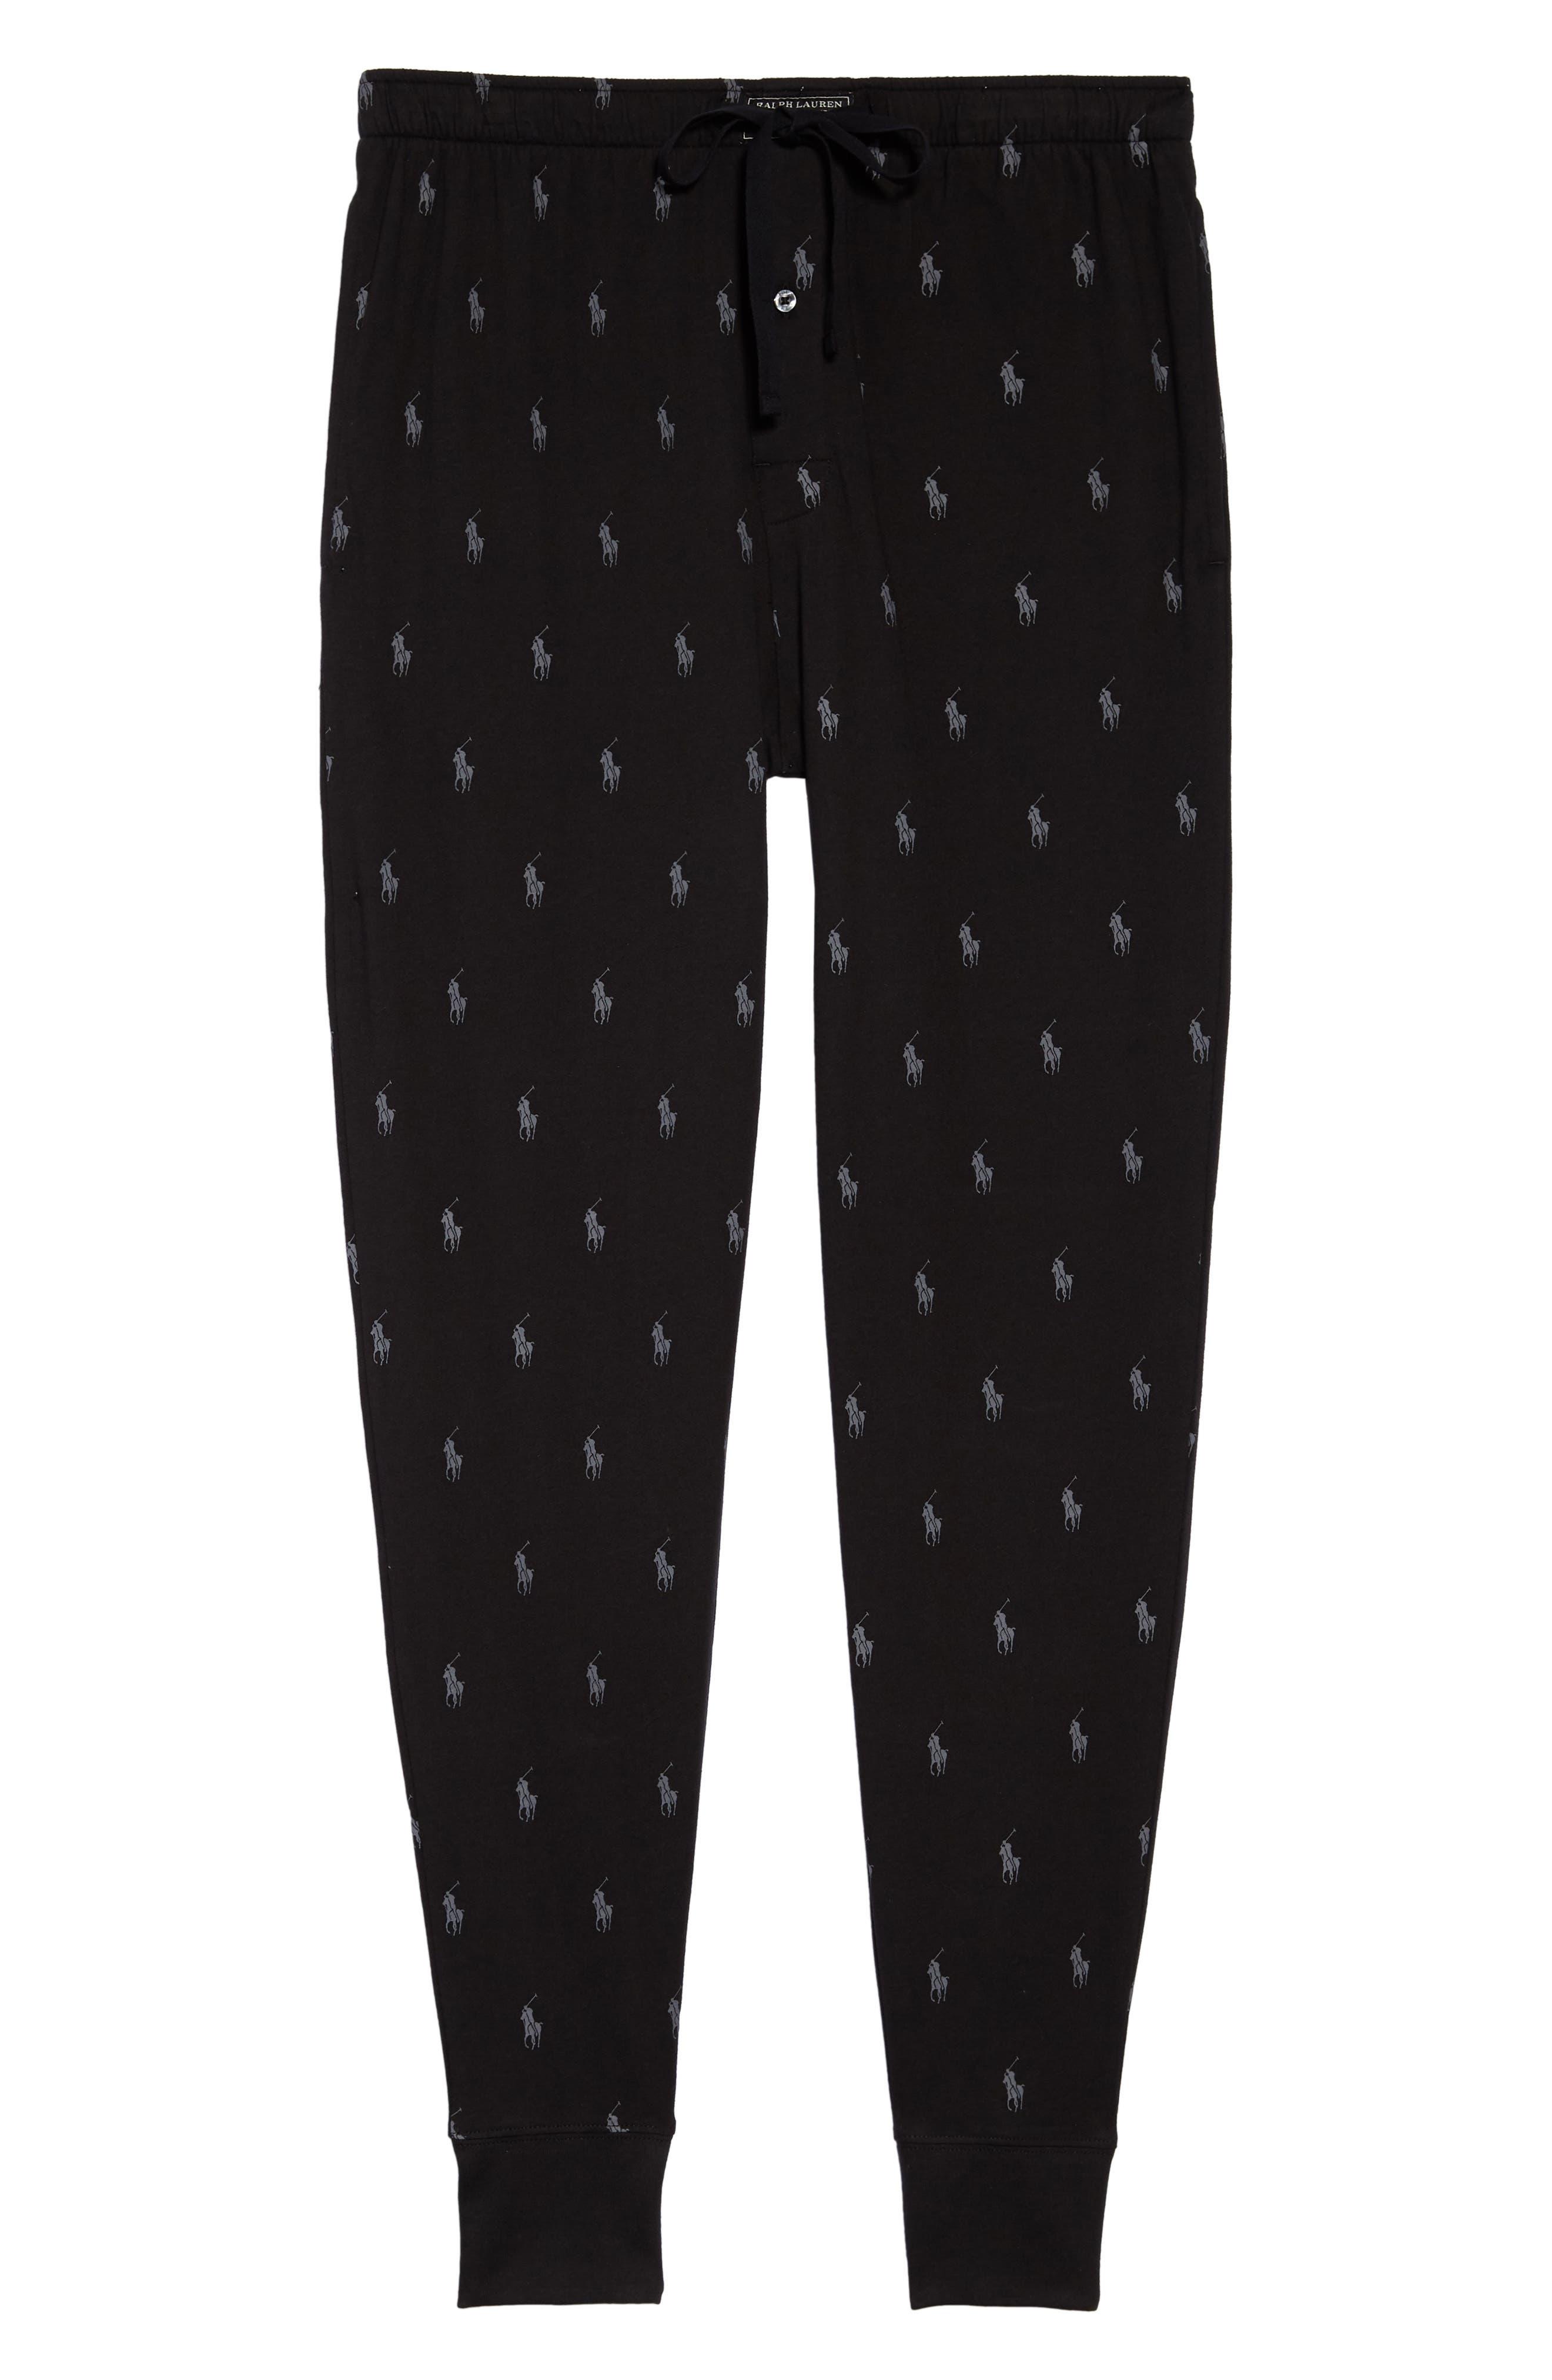 POLO RALPH LAUREN, Pony Print Pajama Pants, Alternate thumbnail 6, color, POLO BLACK